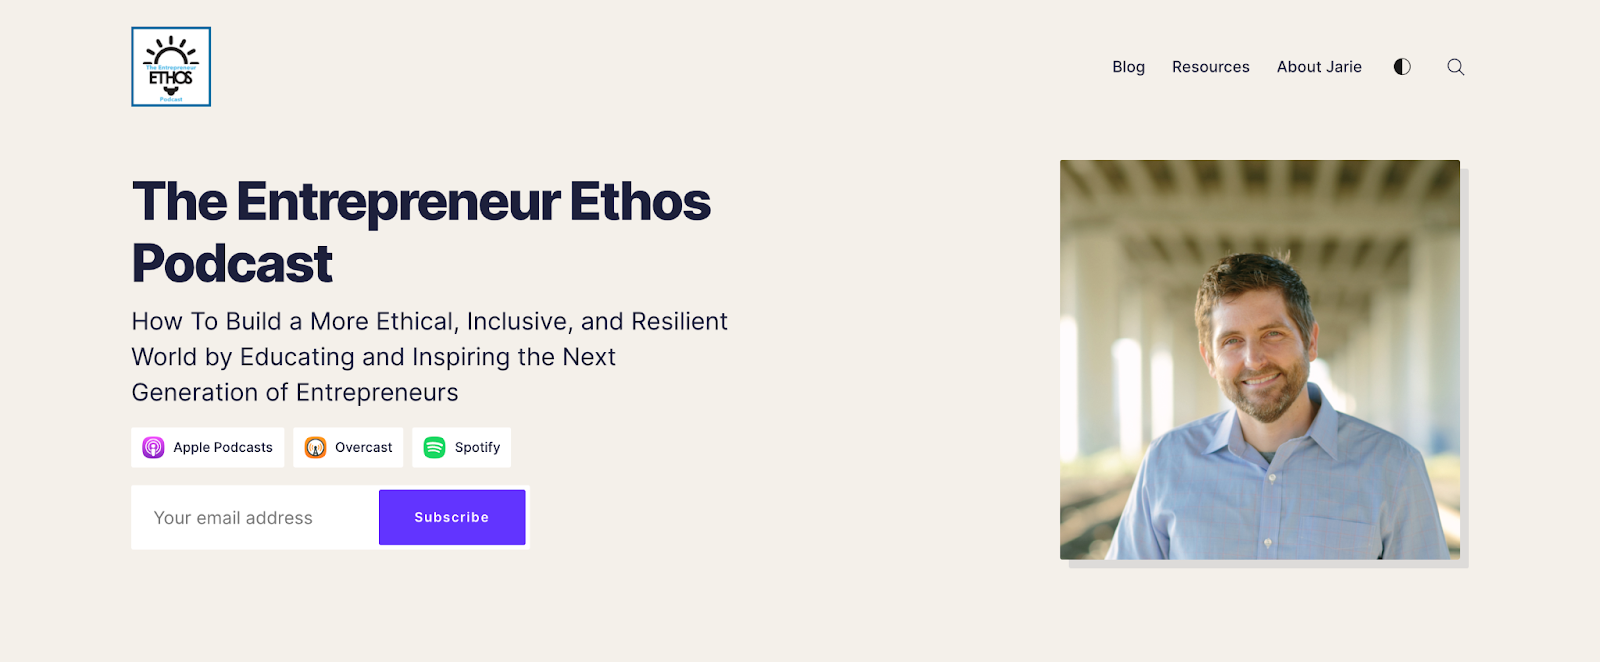 Entreprenuer Ethos podcast